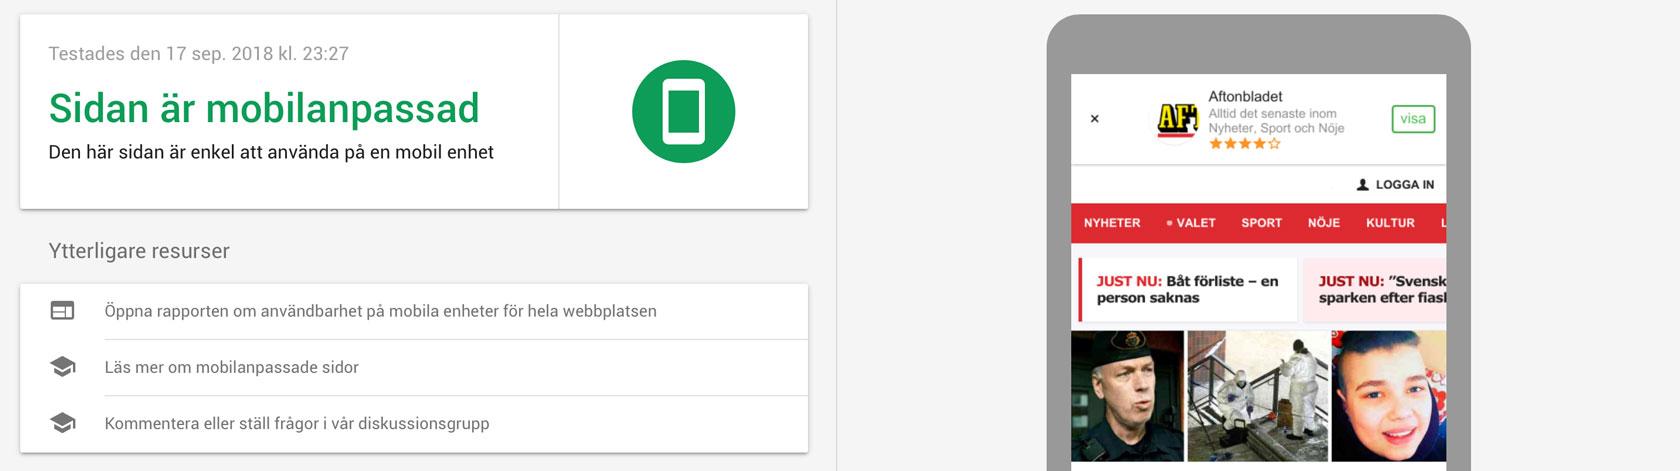 aftonbladet-mobilanpassad-hemsida-Google